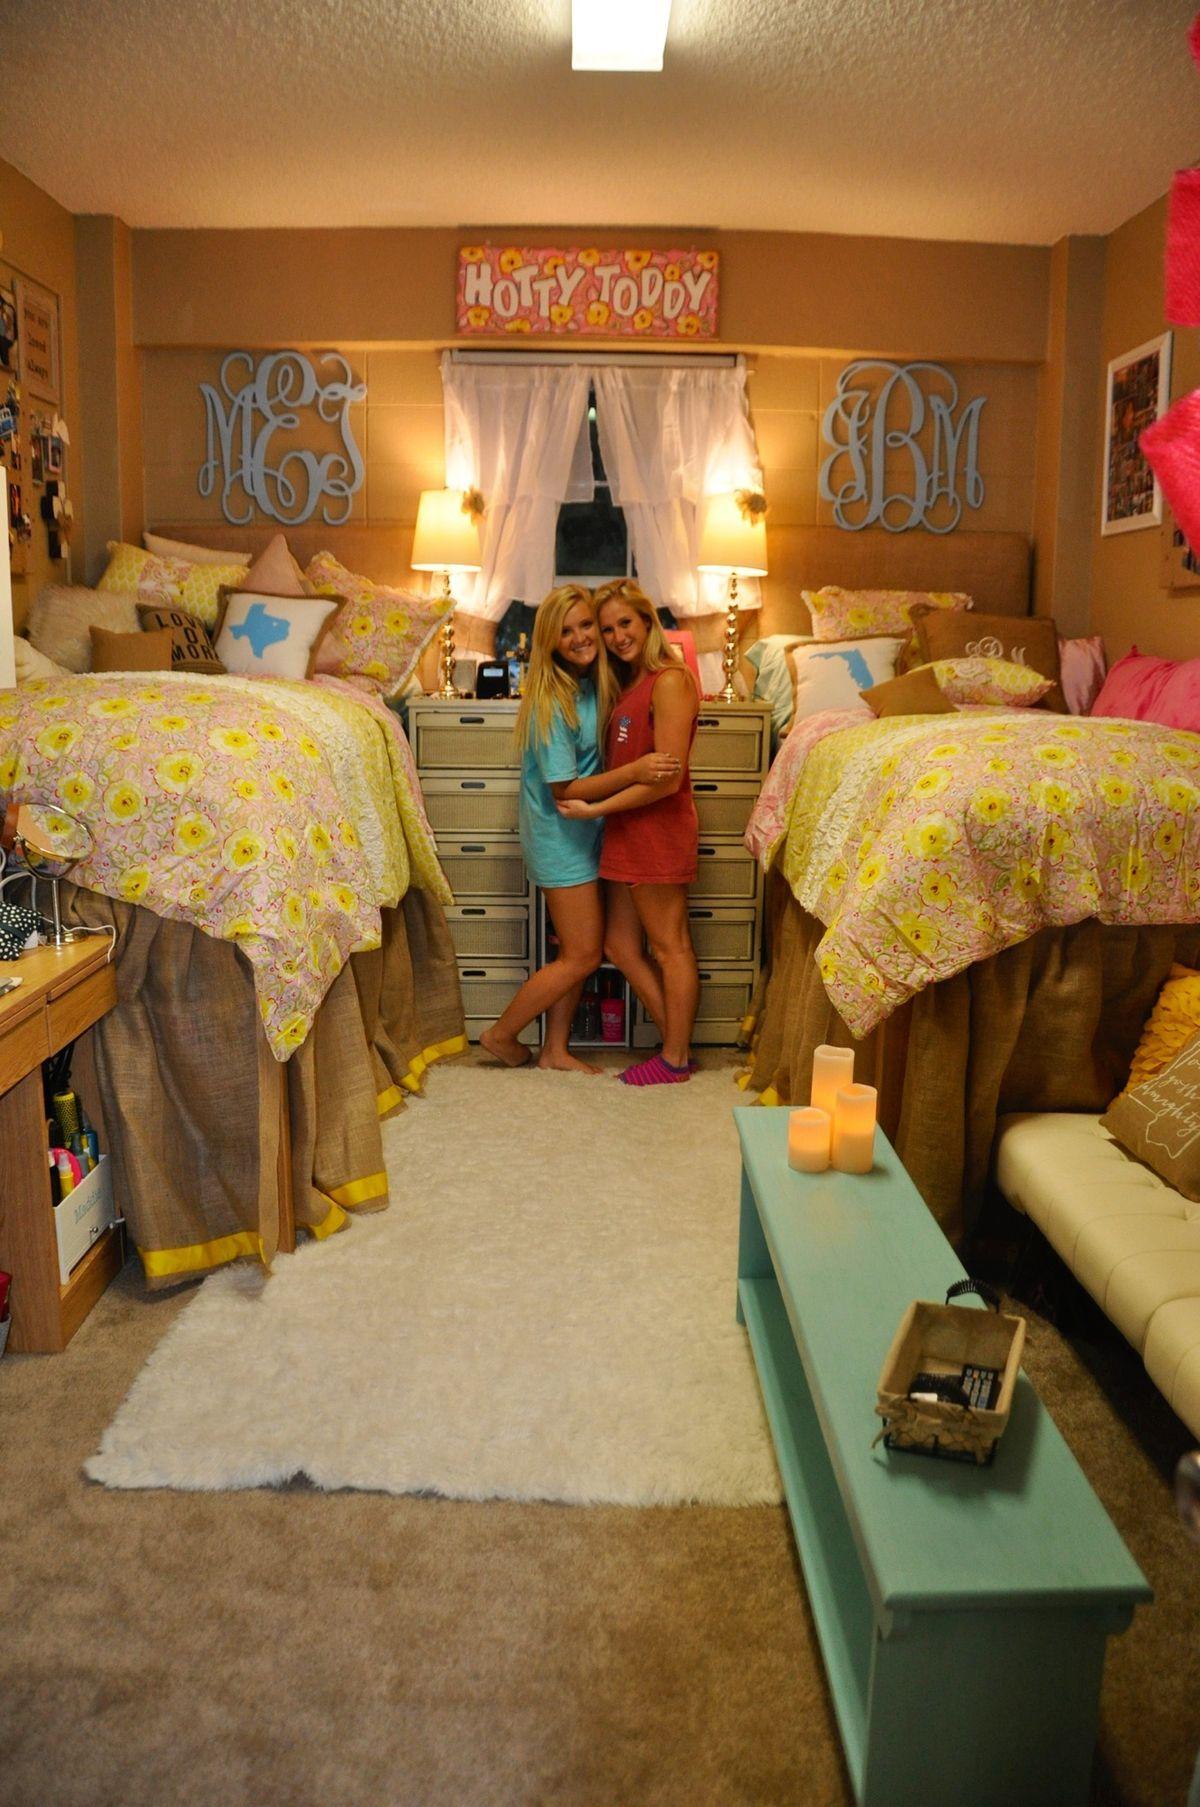 College dorm loft bed ideas  dfaeaafedadfacbag  pixels  dorm room